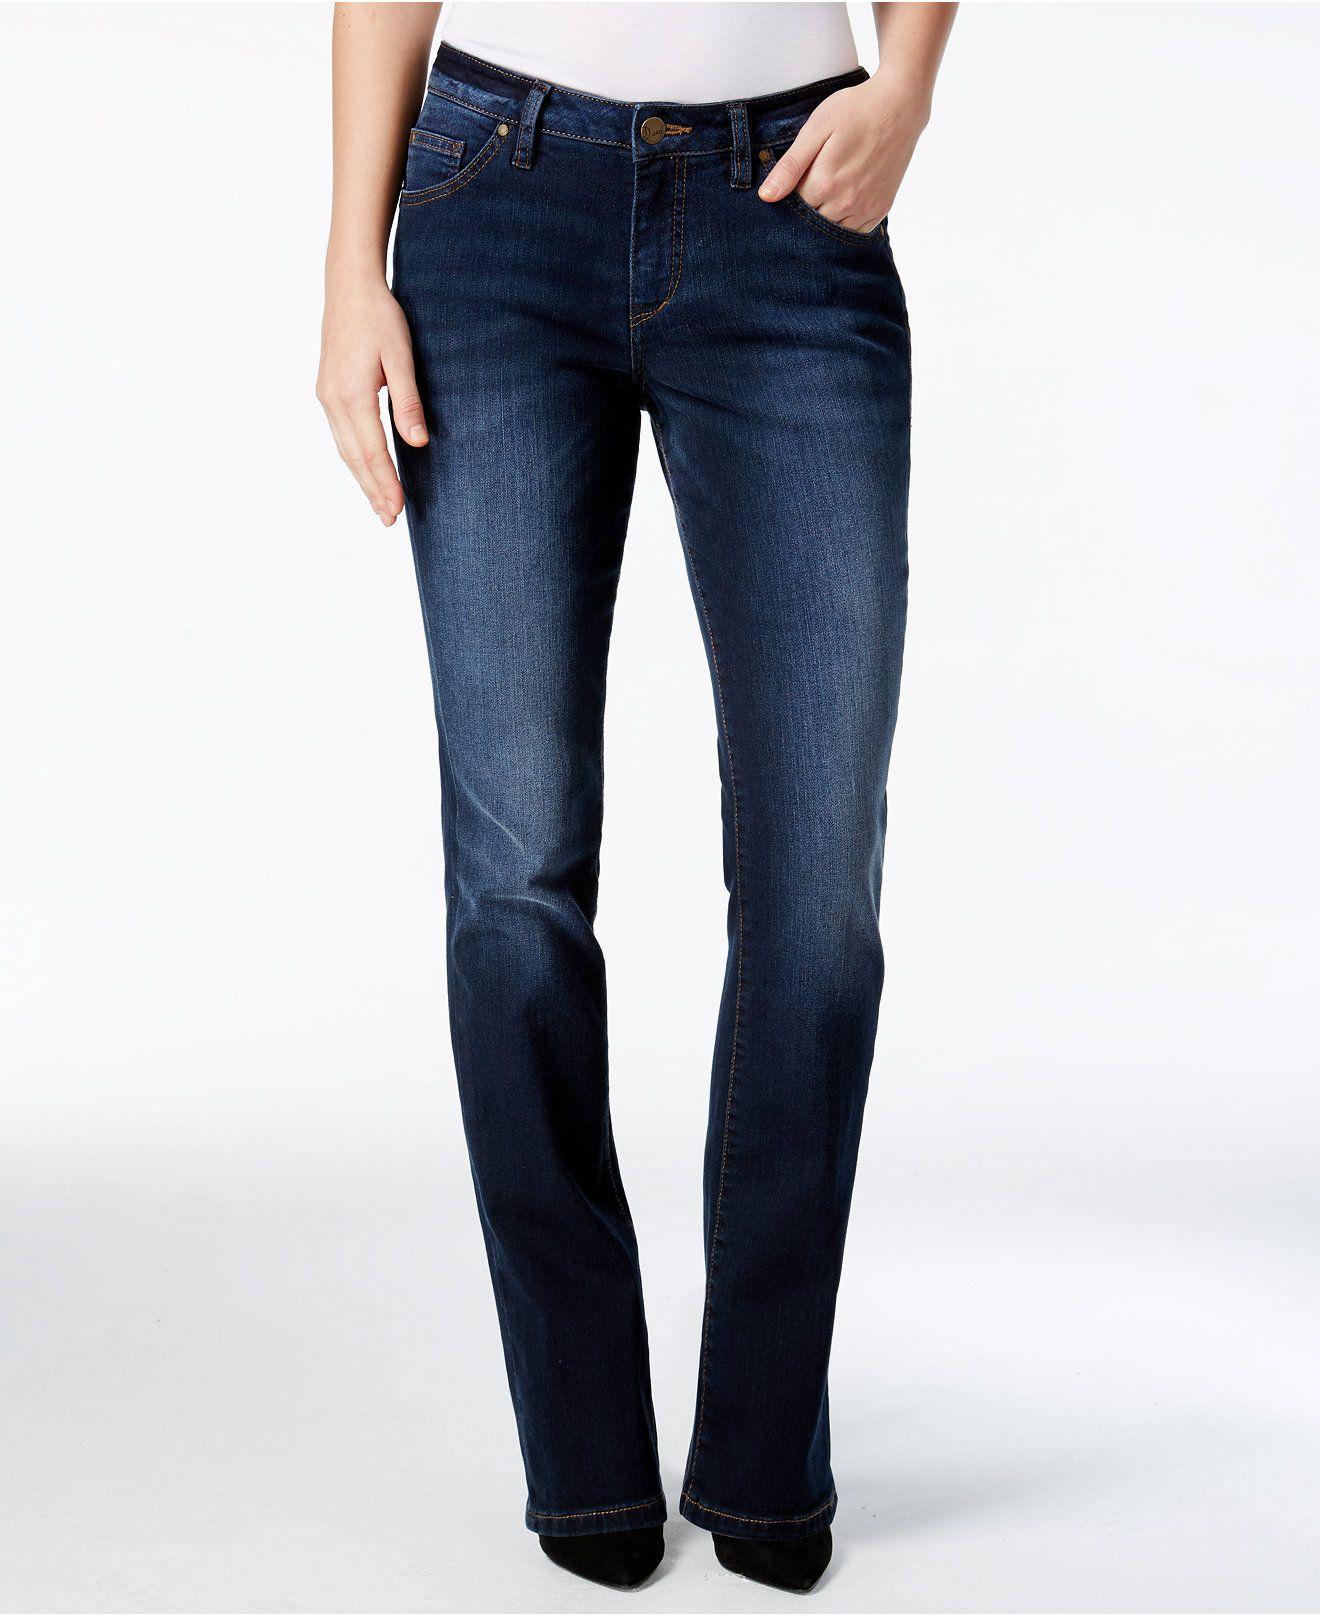 83a0539b74 JAG Atwood Medium Indigo Bootcut Jeans - Jeans - Women - Macy s